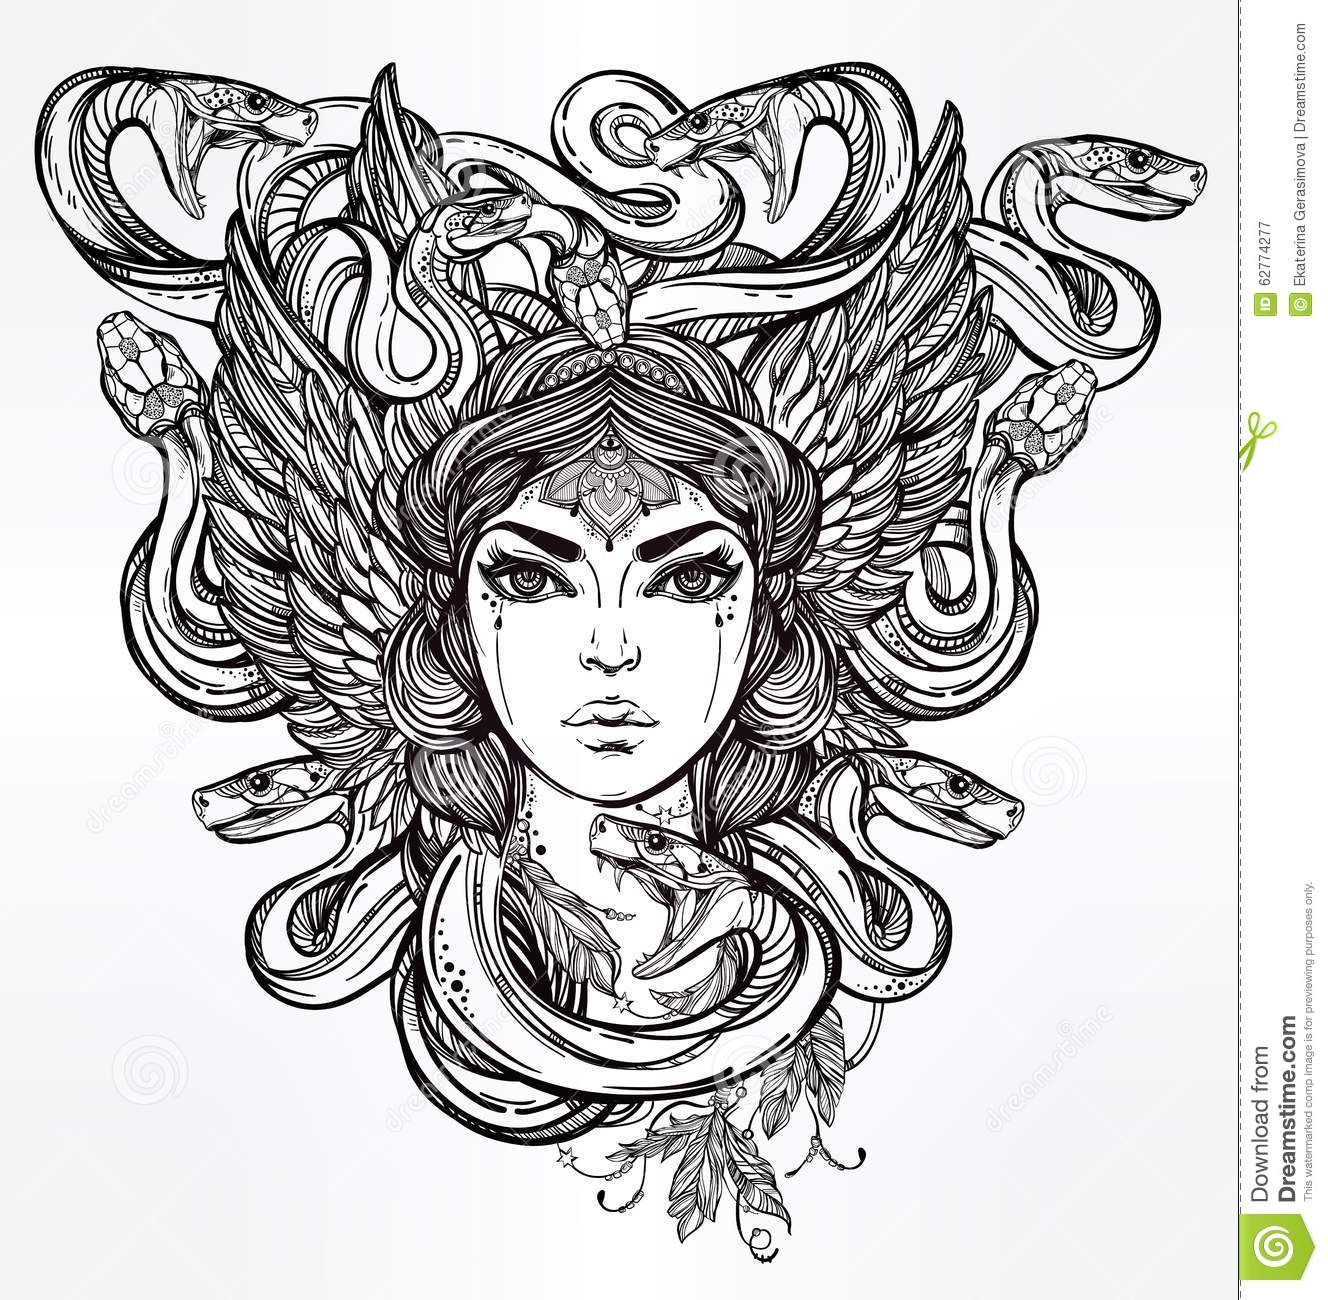 resultado de imagen de medusa mitologia ilustracion medusa mithology pinterest im genes. Black Bedroom Furniture Sets. Home Design Ideas